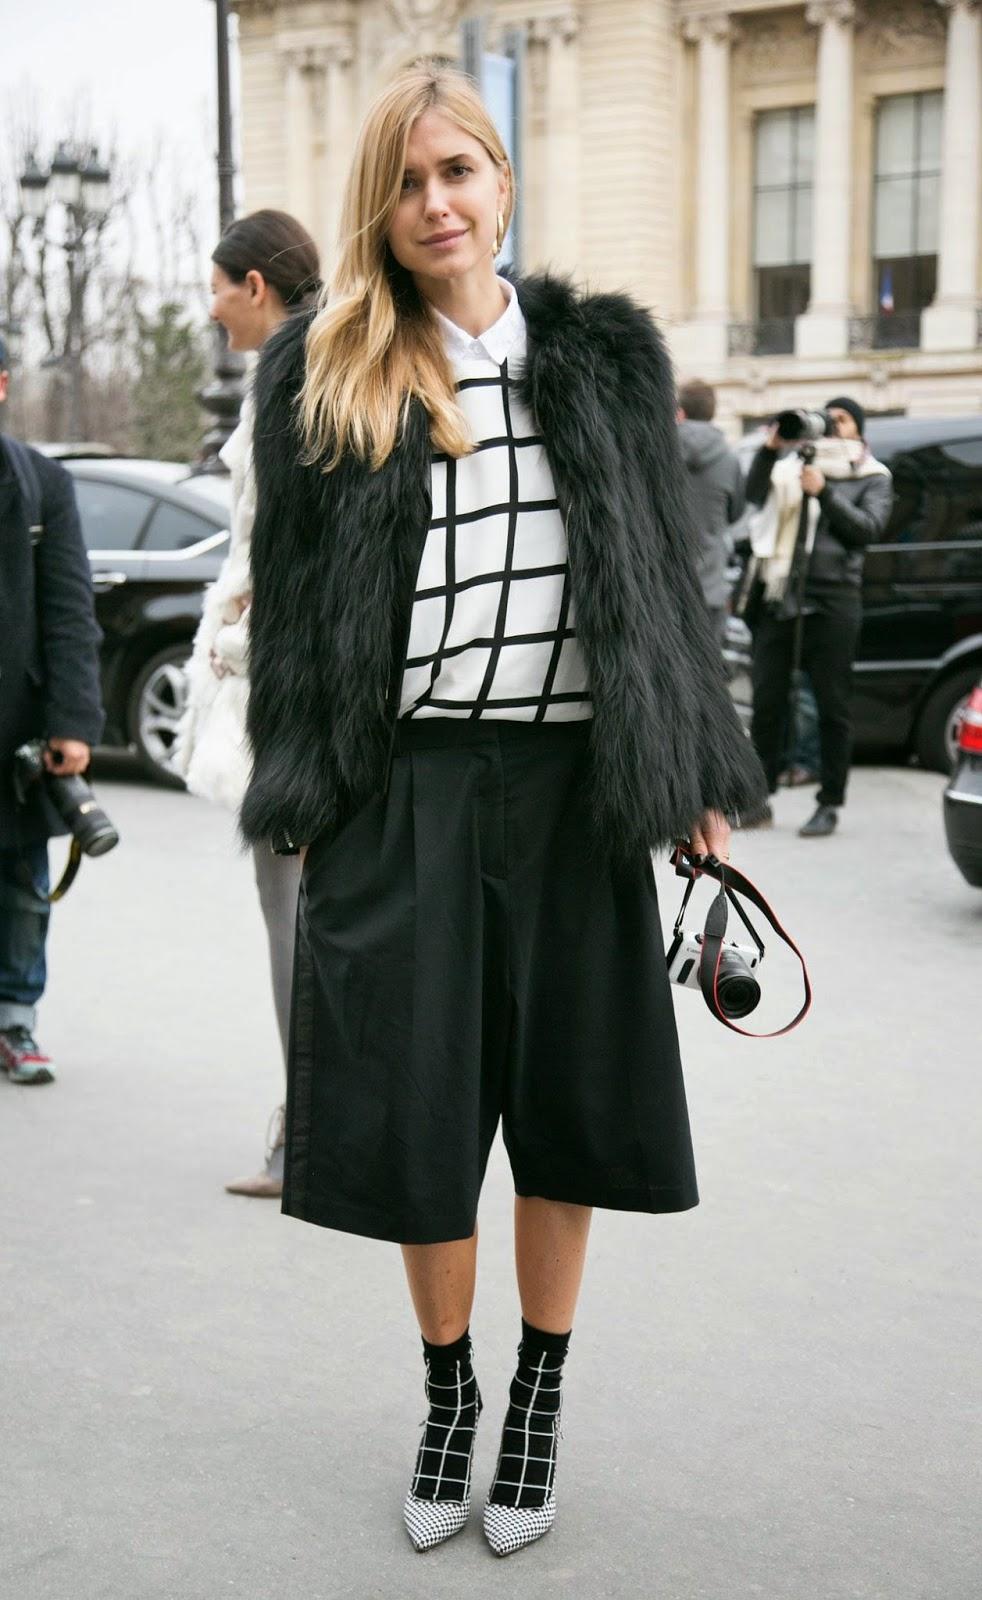 Eniwhere Fashion - Culottes - Pelliccia - Trend FW 2014-15